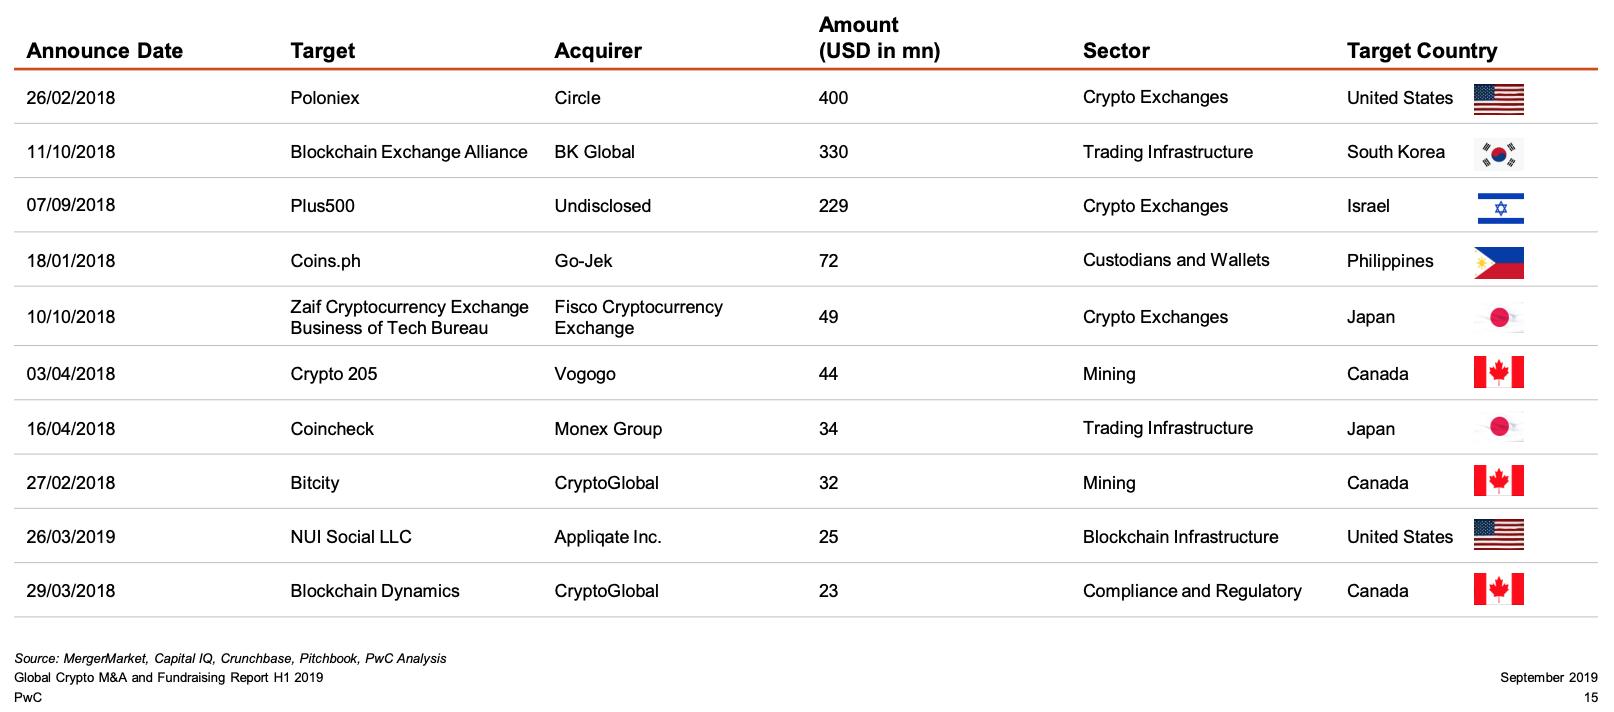 Top 10 Crypto M&A Deals, PwC, September 2019